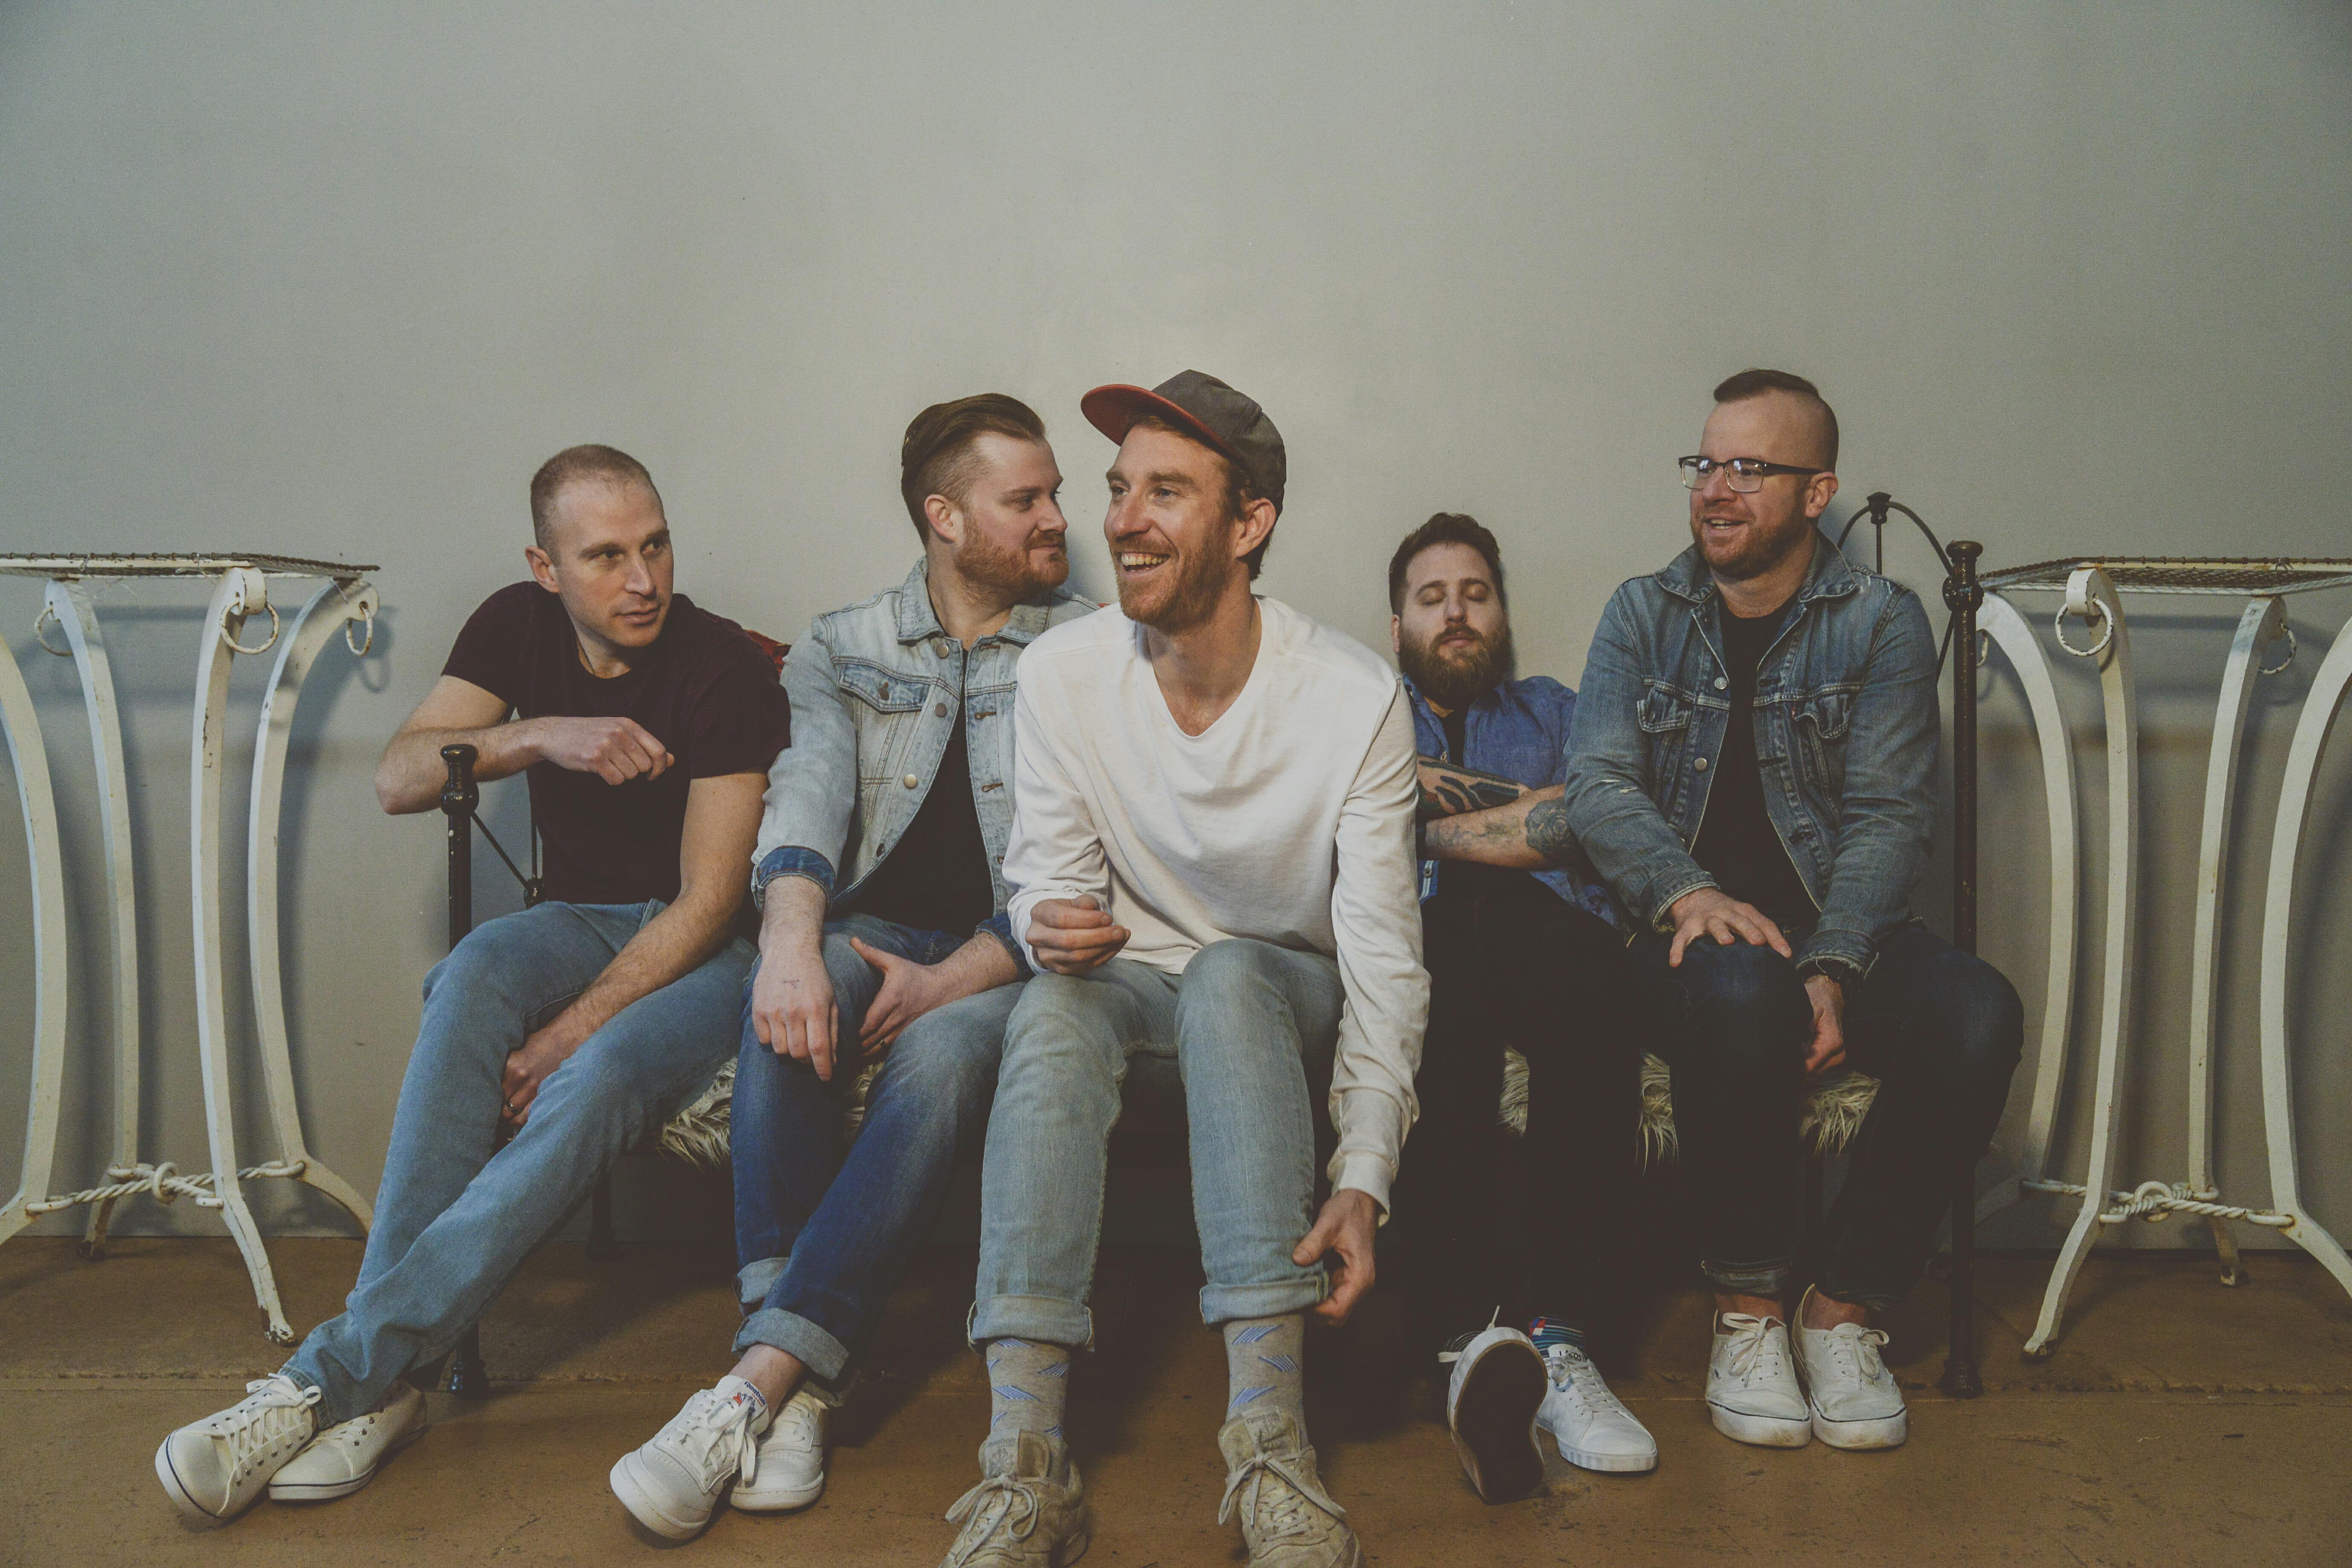 PREMIERE: Bronze Radio Return release thrilling EP 'Check Two'